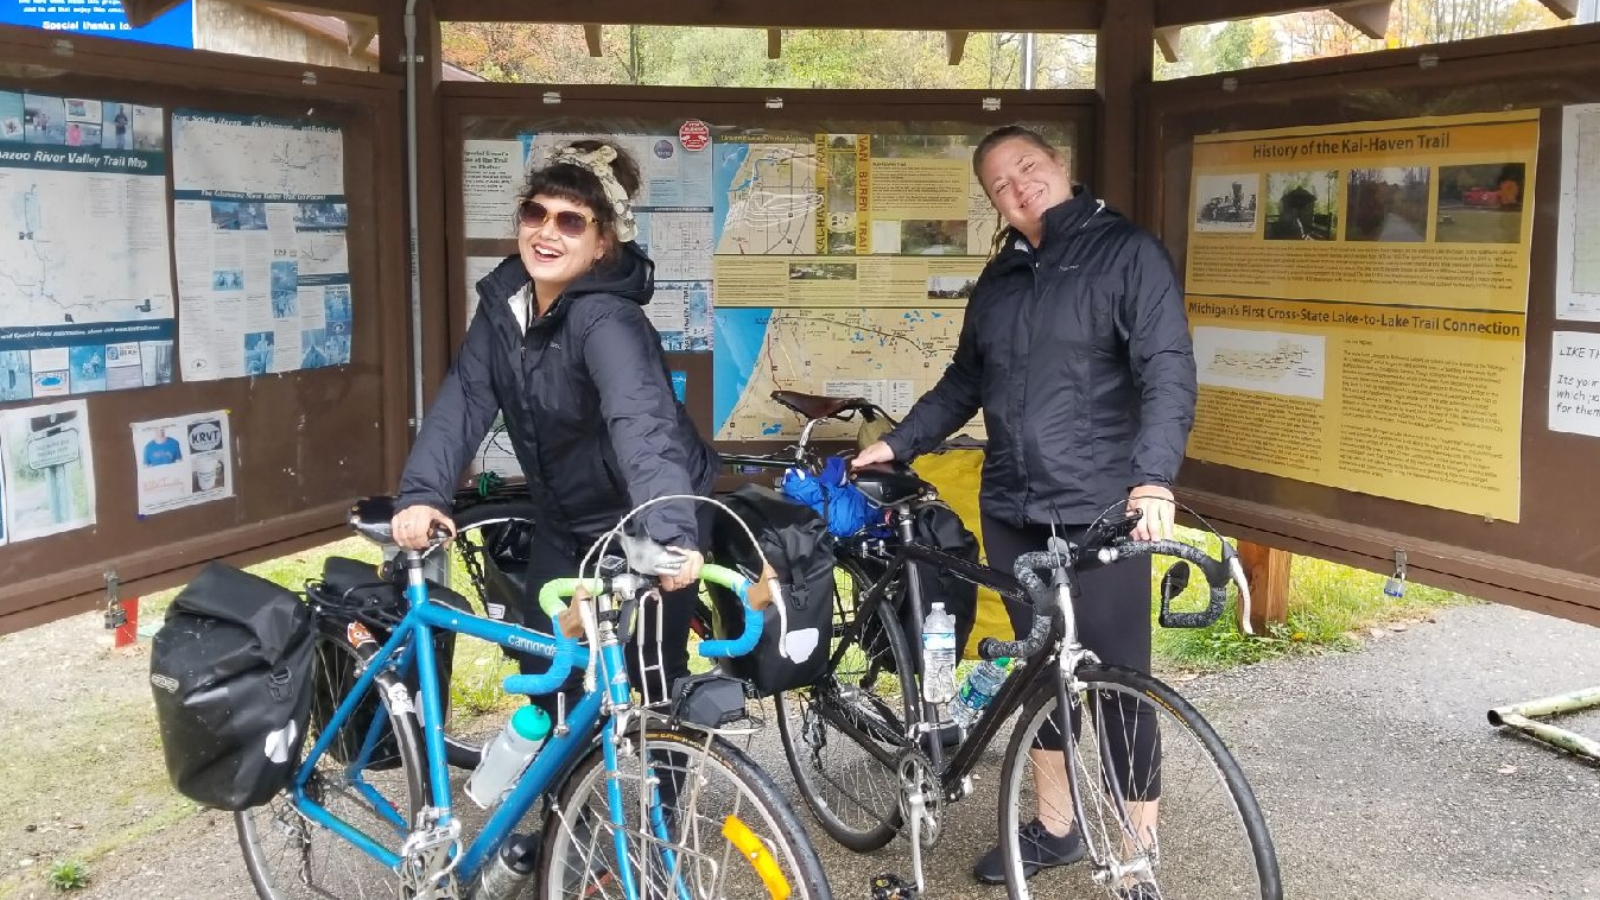 Wheelhouse Detroit general manager Tatiana Pastor (L) on a bike tour with owner Kelli Kavanaugh